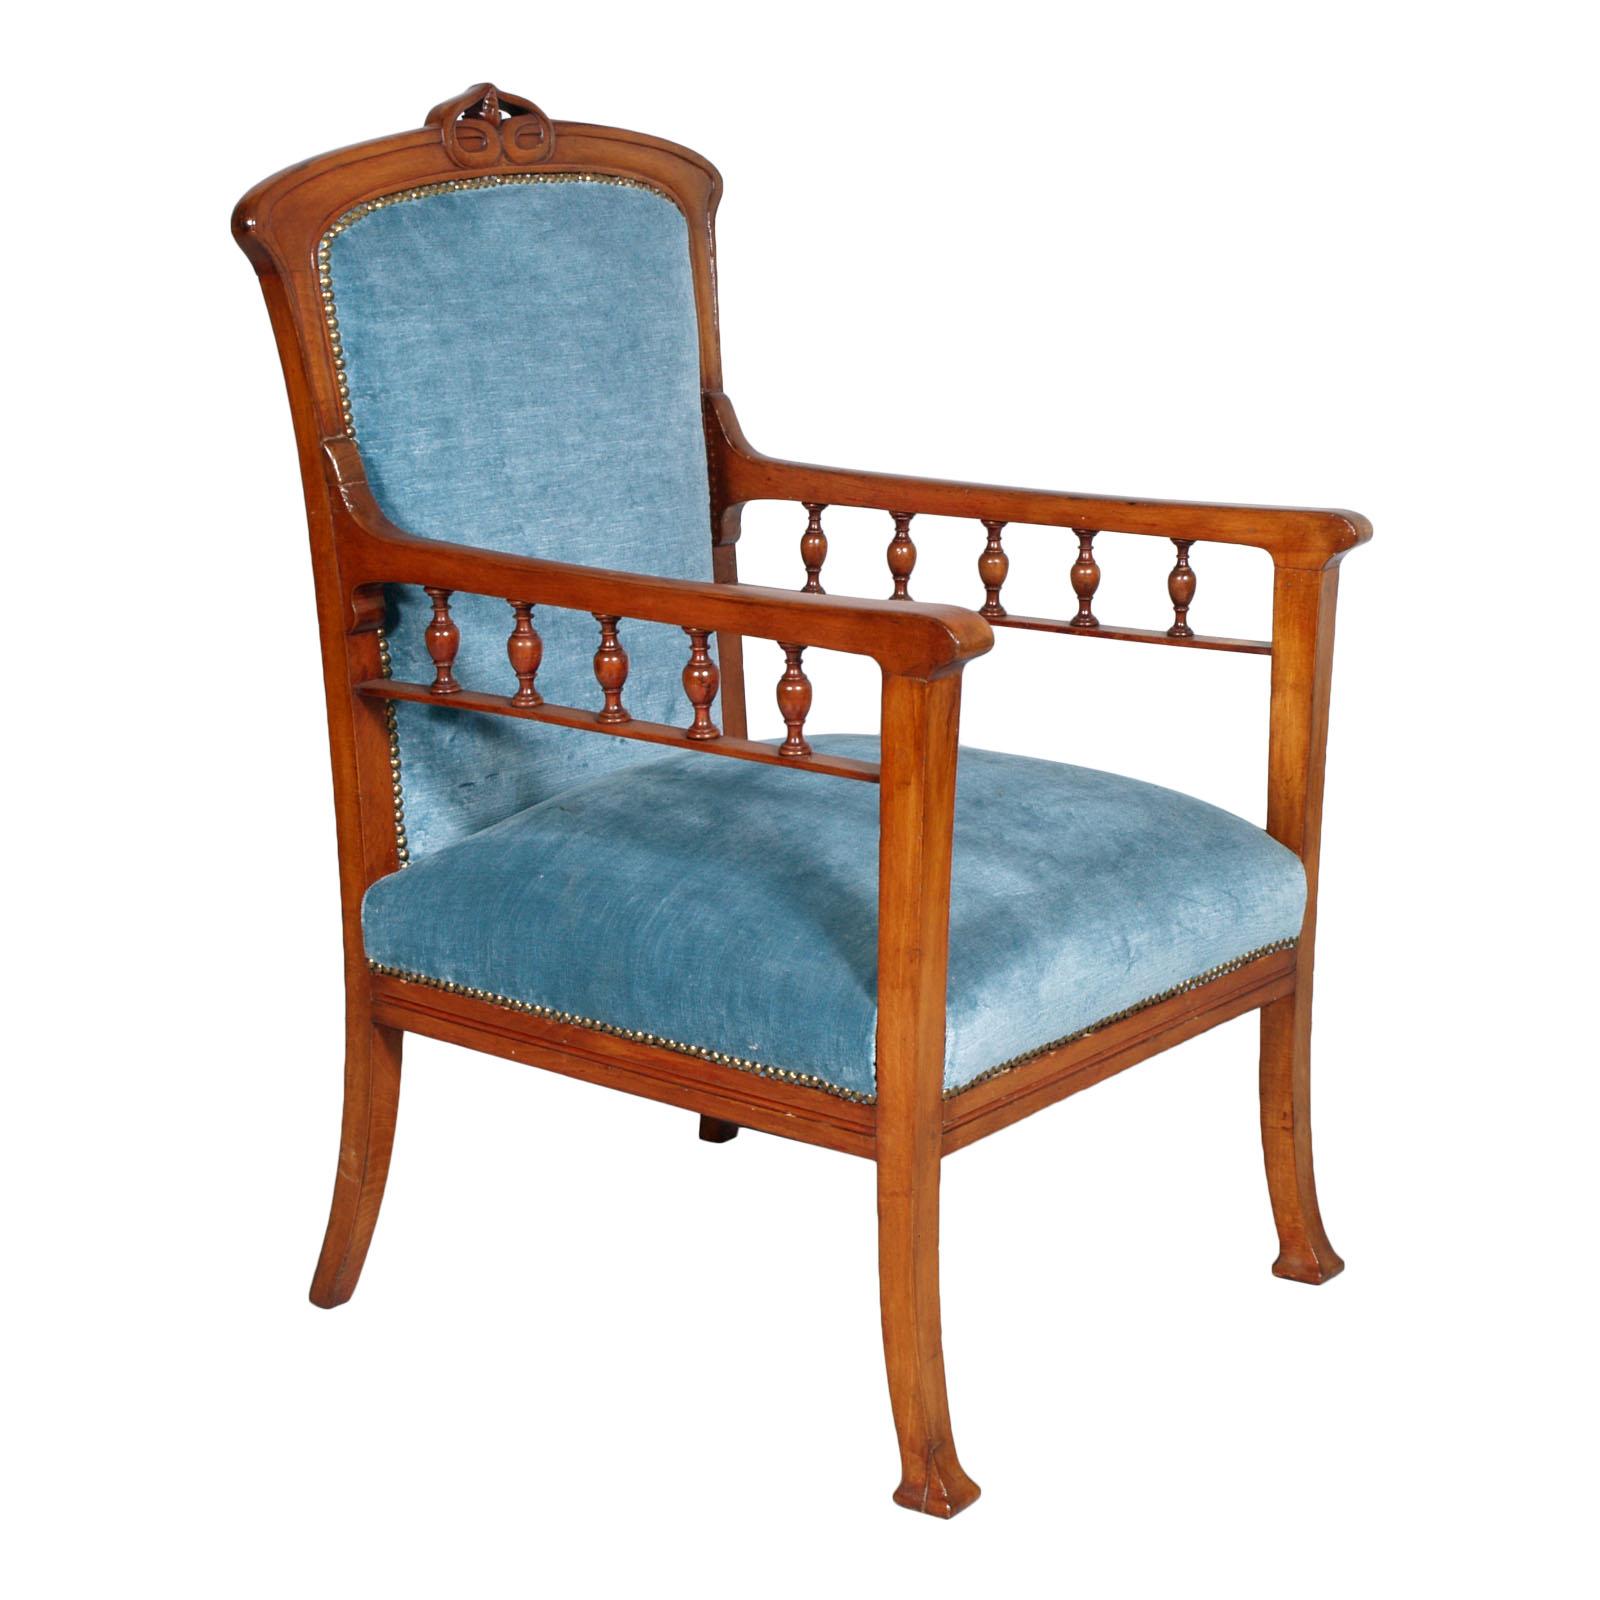 Antique liberty armchair chair sedia braccioli poltrona for Poltrona liberty